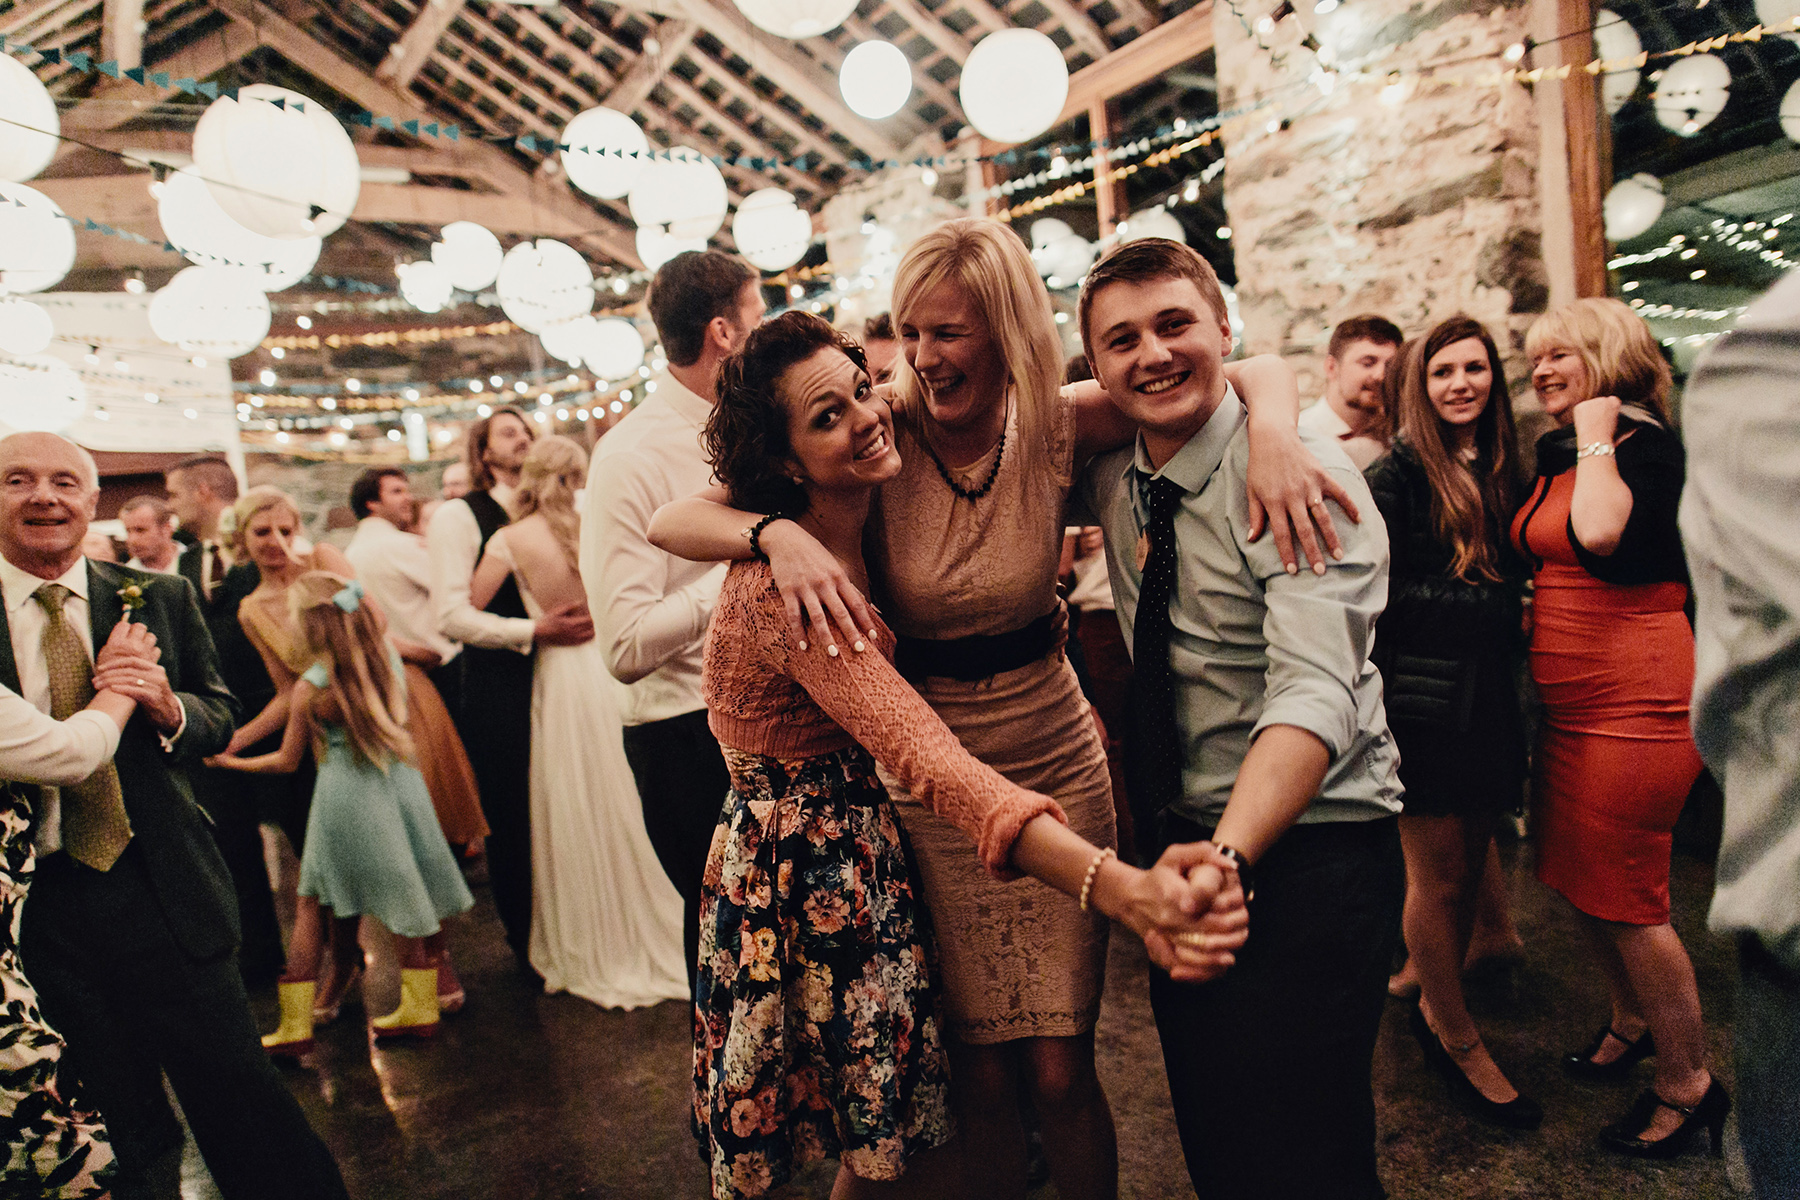 Snowdonia-Wales-Wedding-Photos-0407.jpg